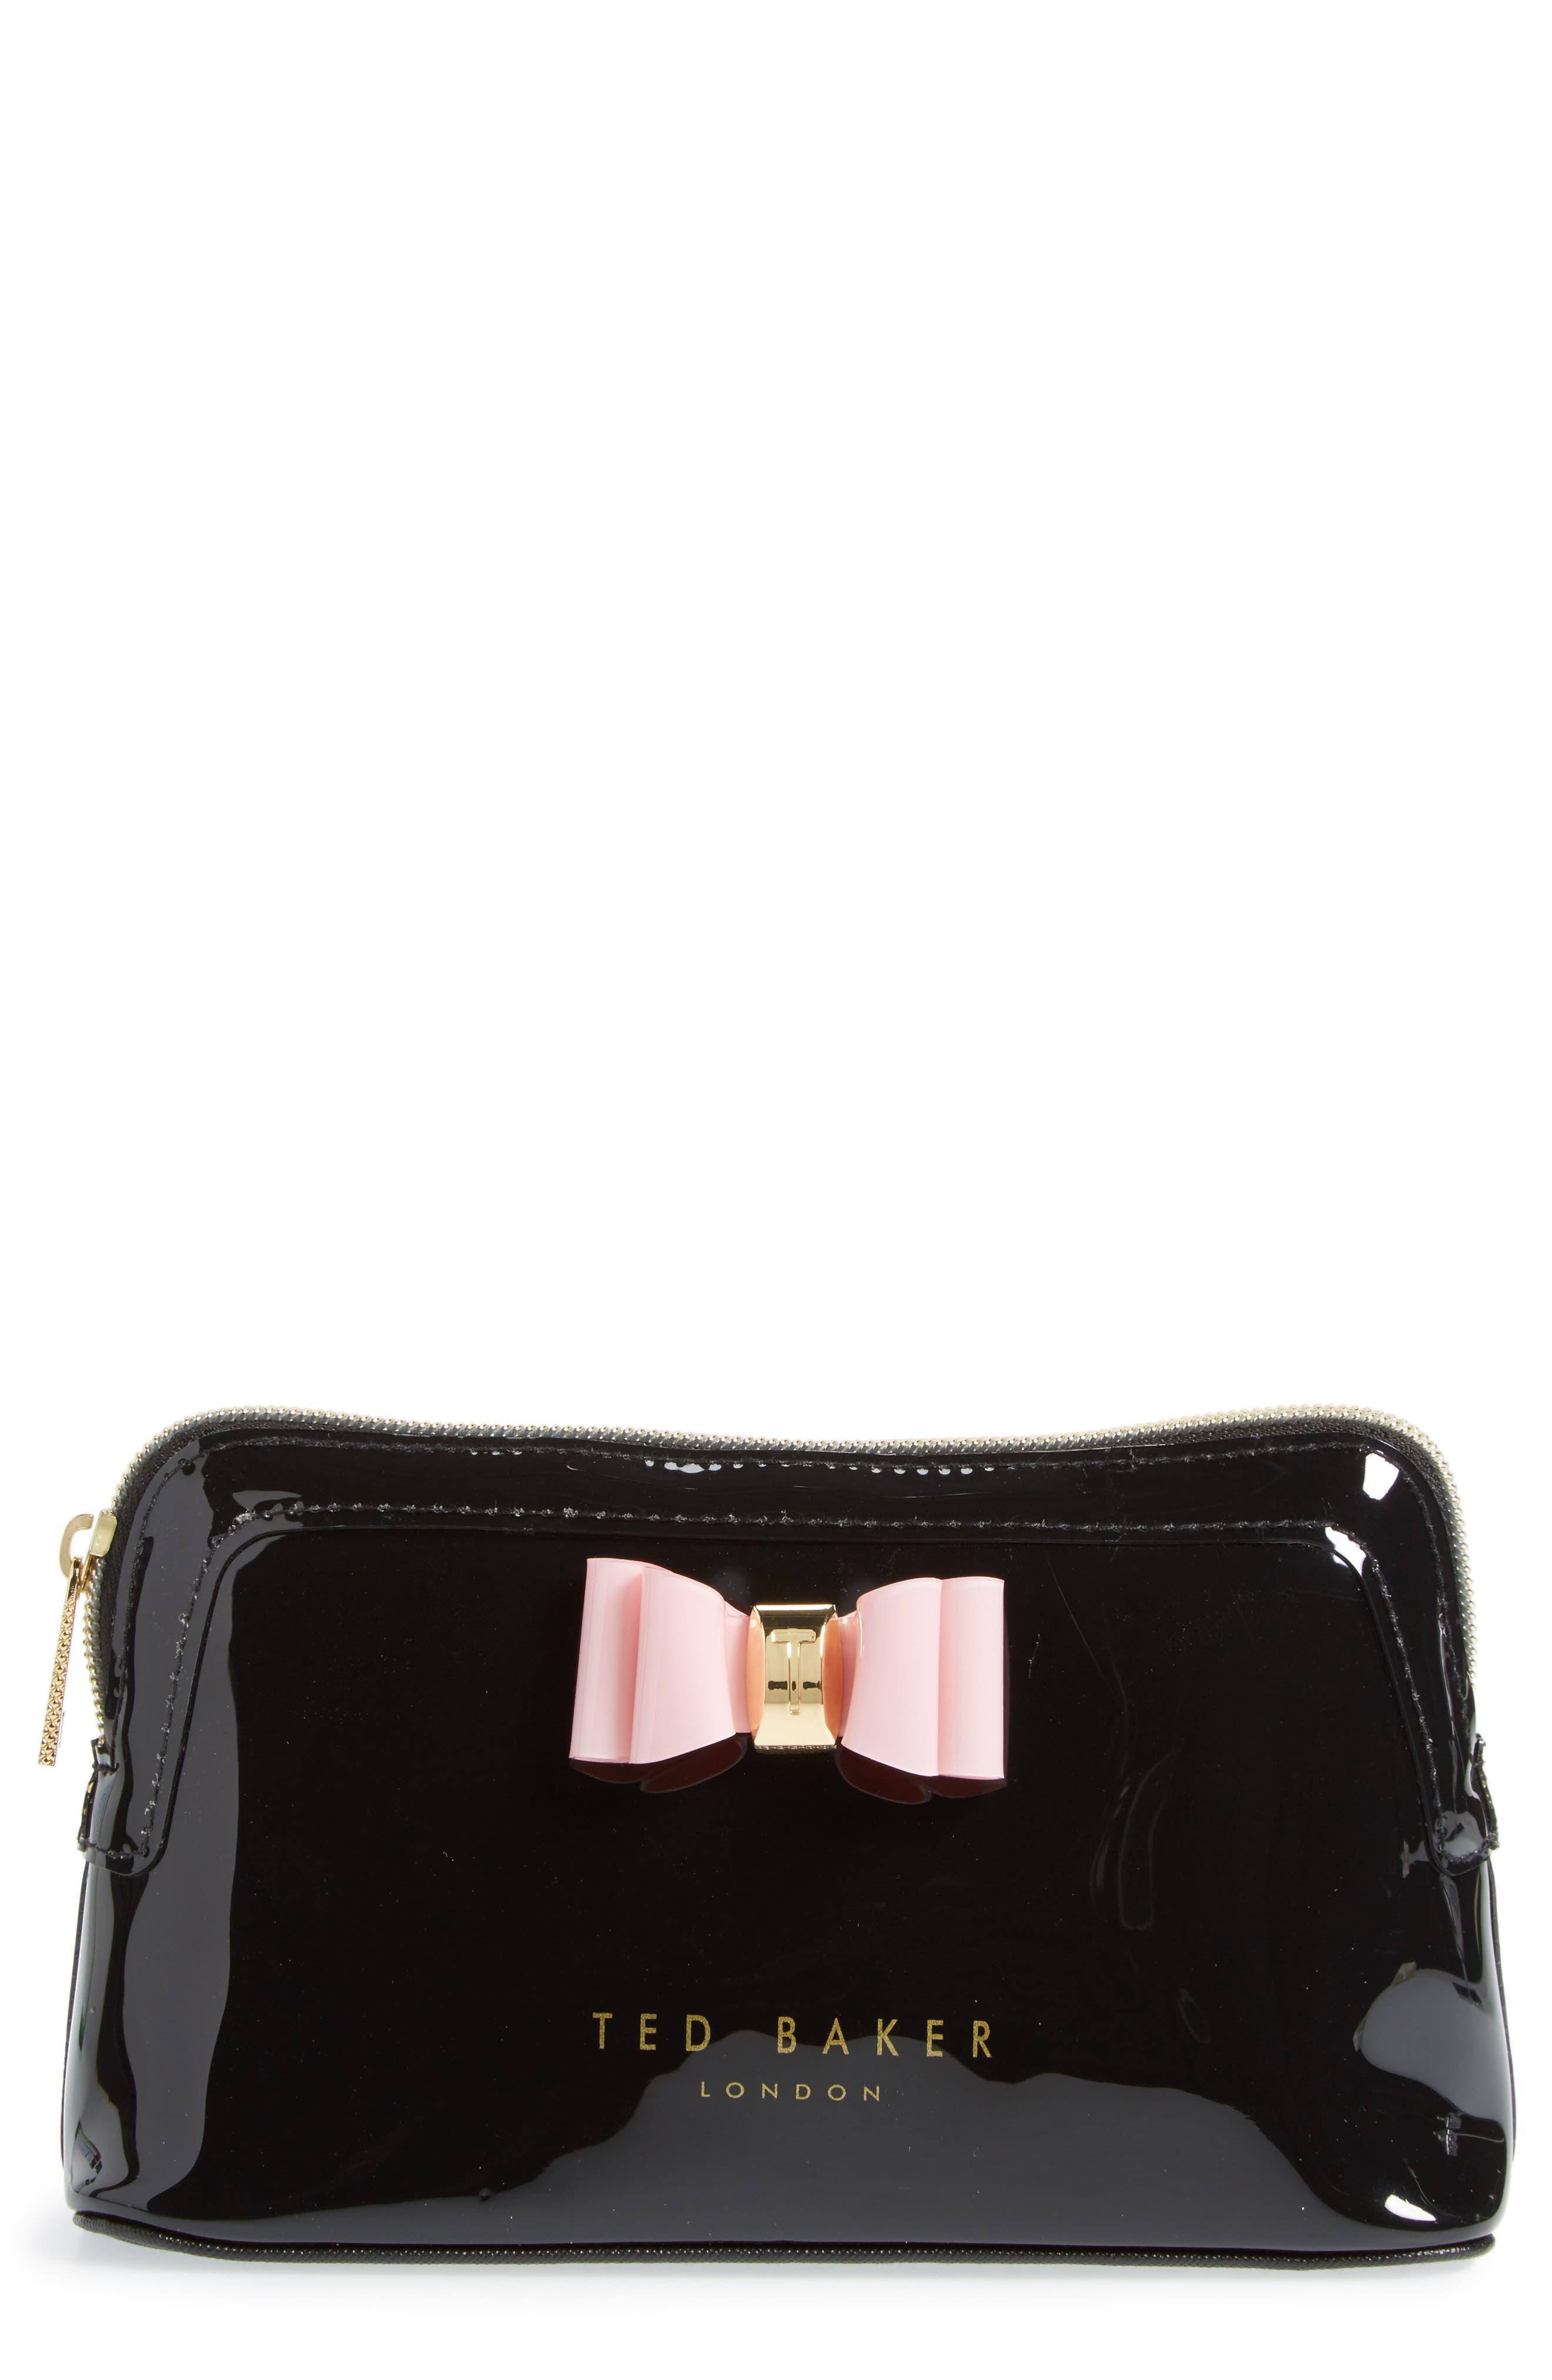 Ted Baker London Julis Bow Cosmetics Bag